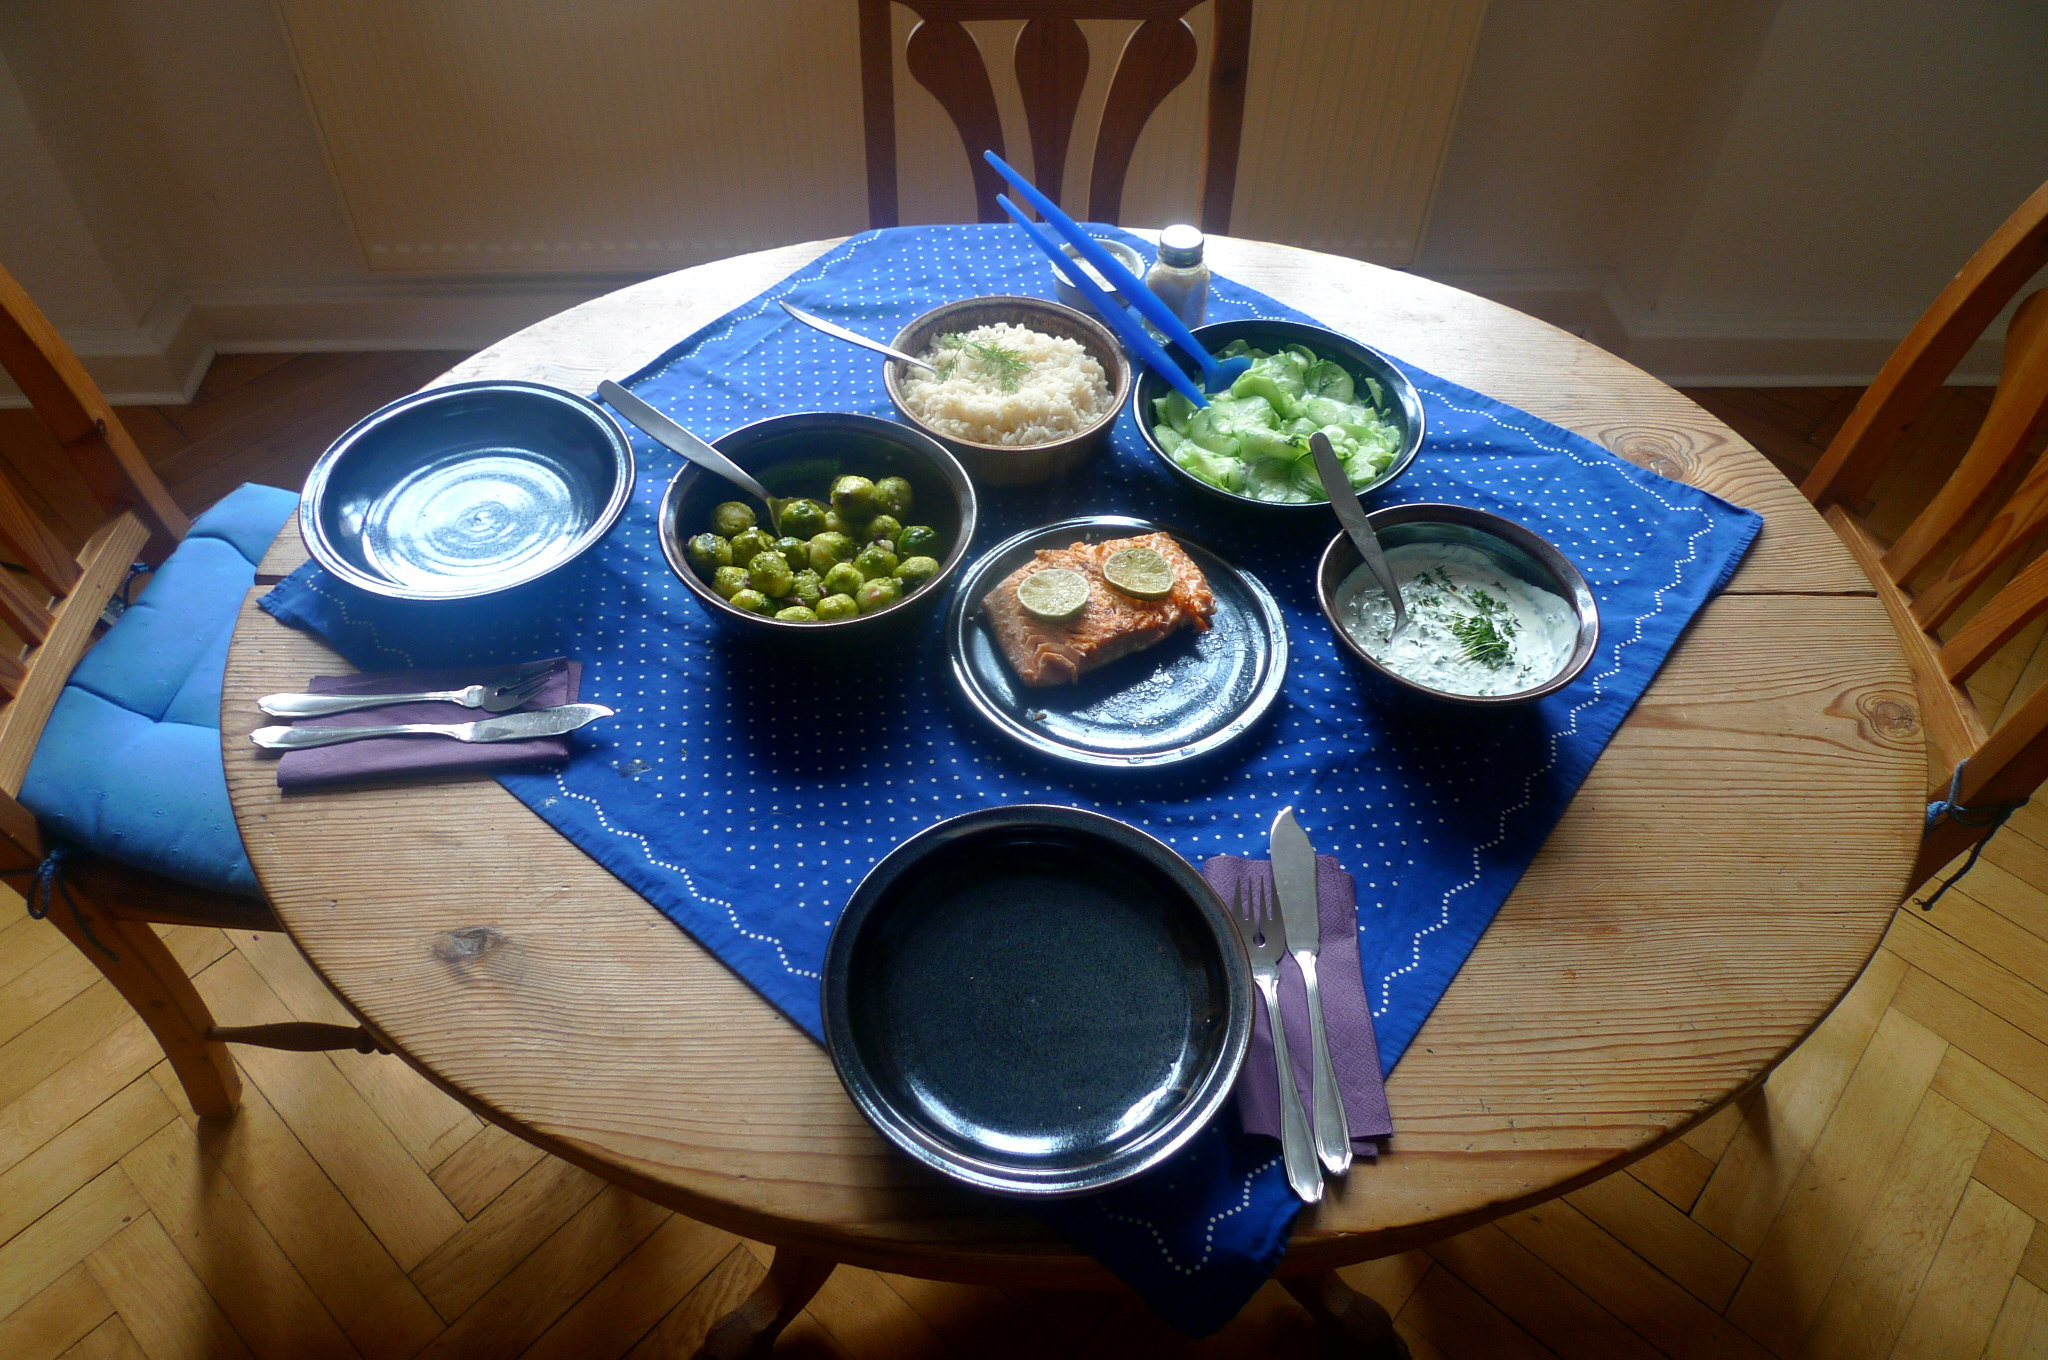 lachsreisrosenkohlsalatgurkensalat-2